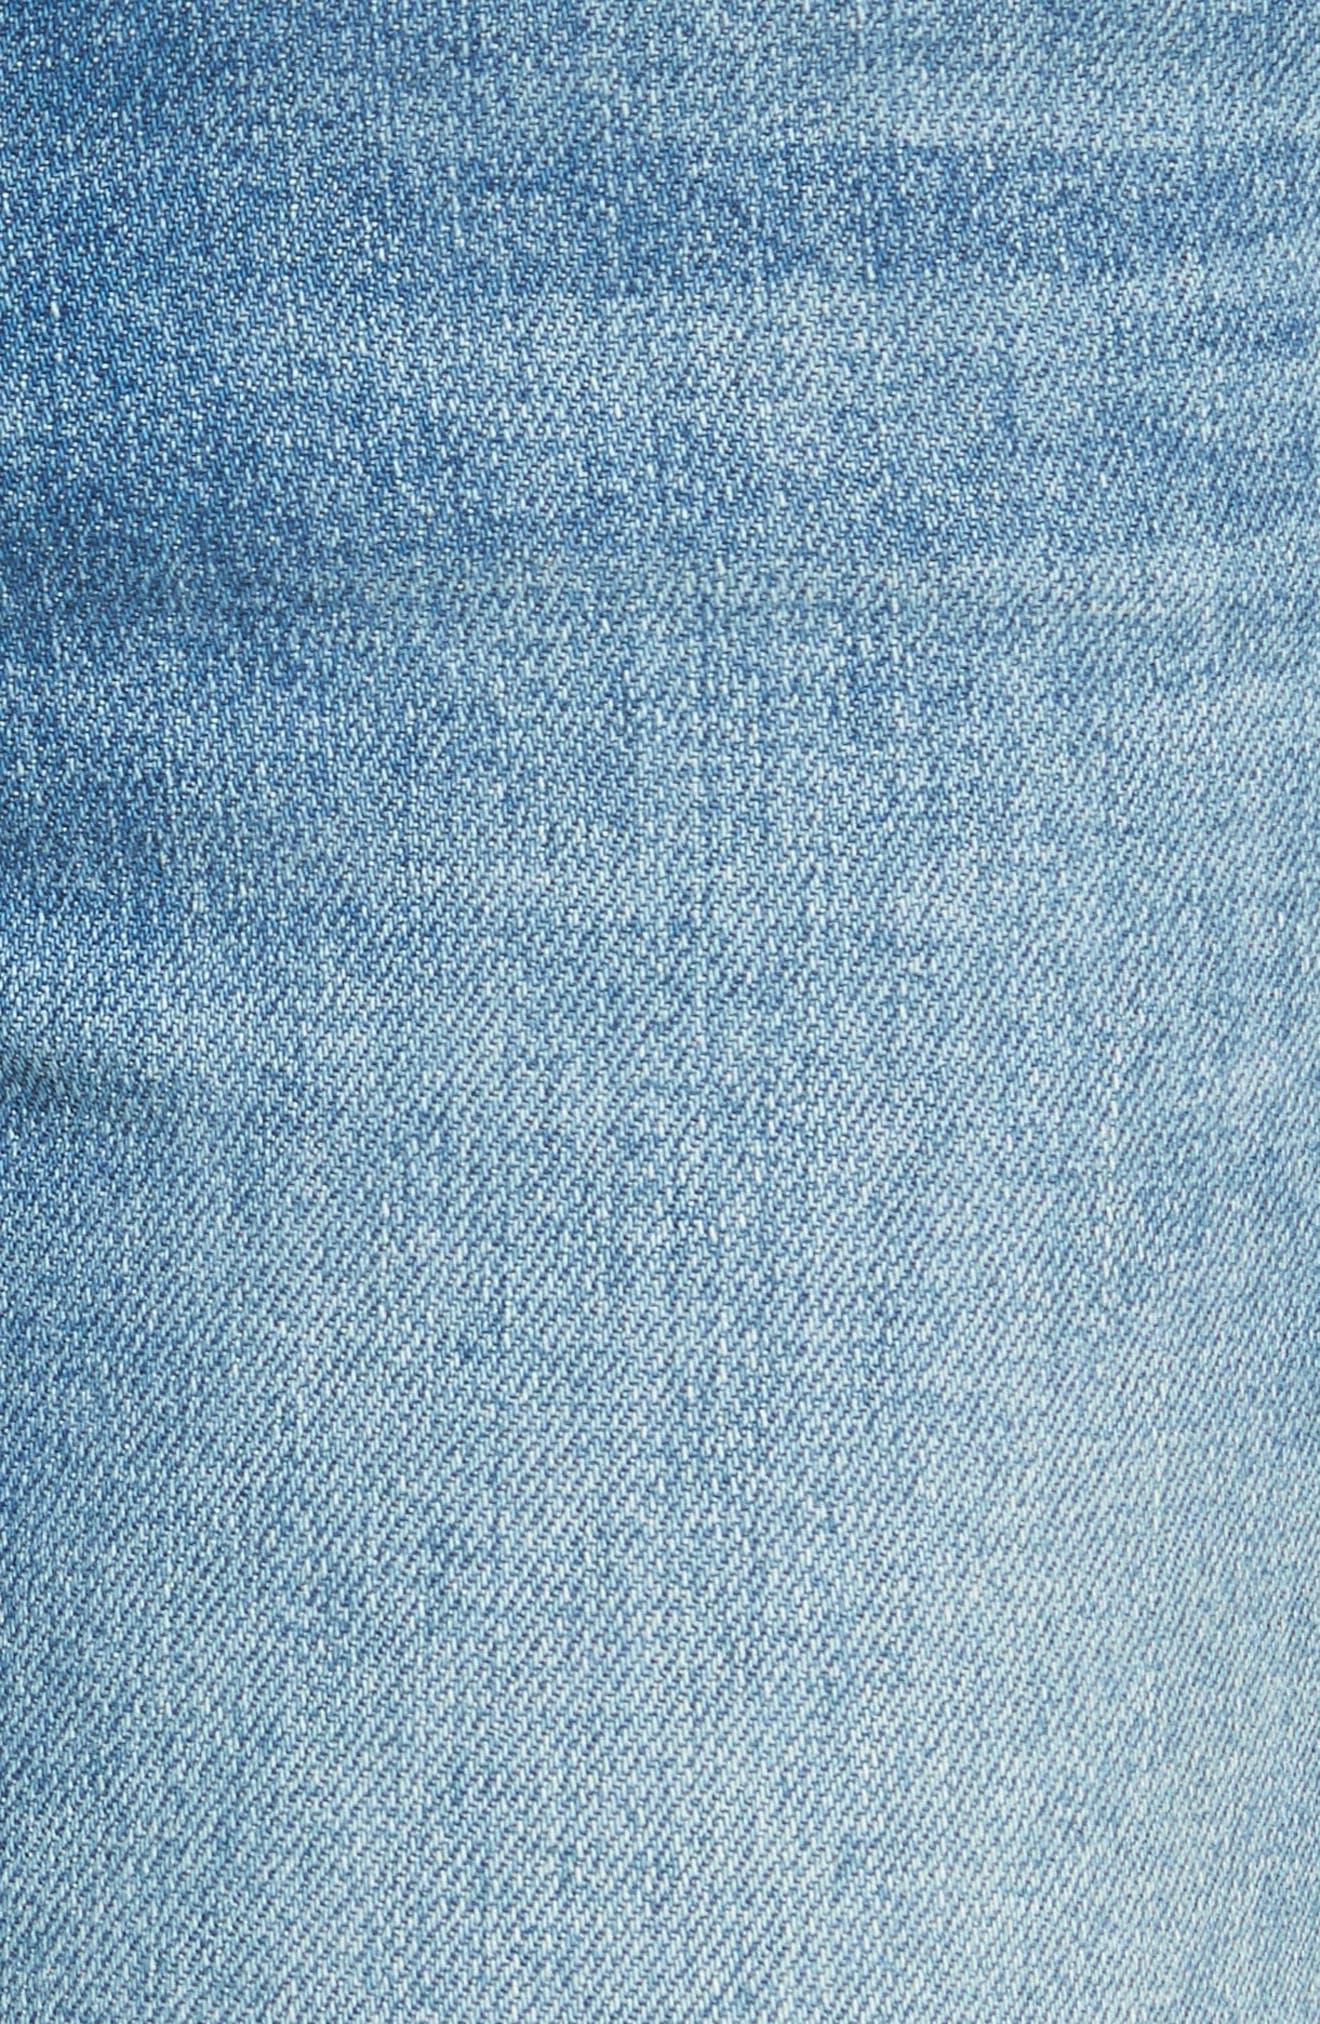 The Rascal High Waist Ankle Jeans,                             Alternate thumbnail 5, color,                             415